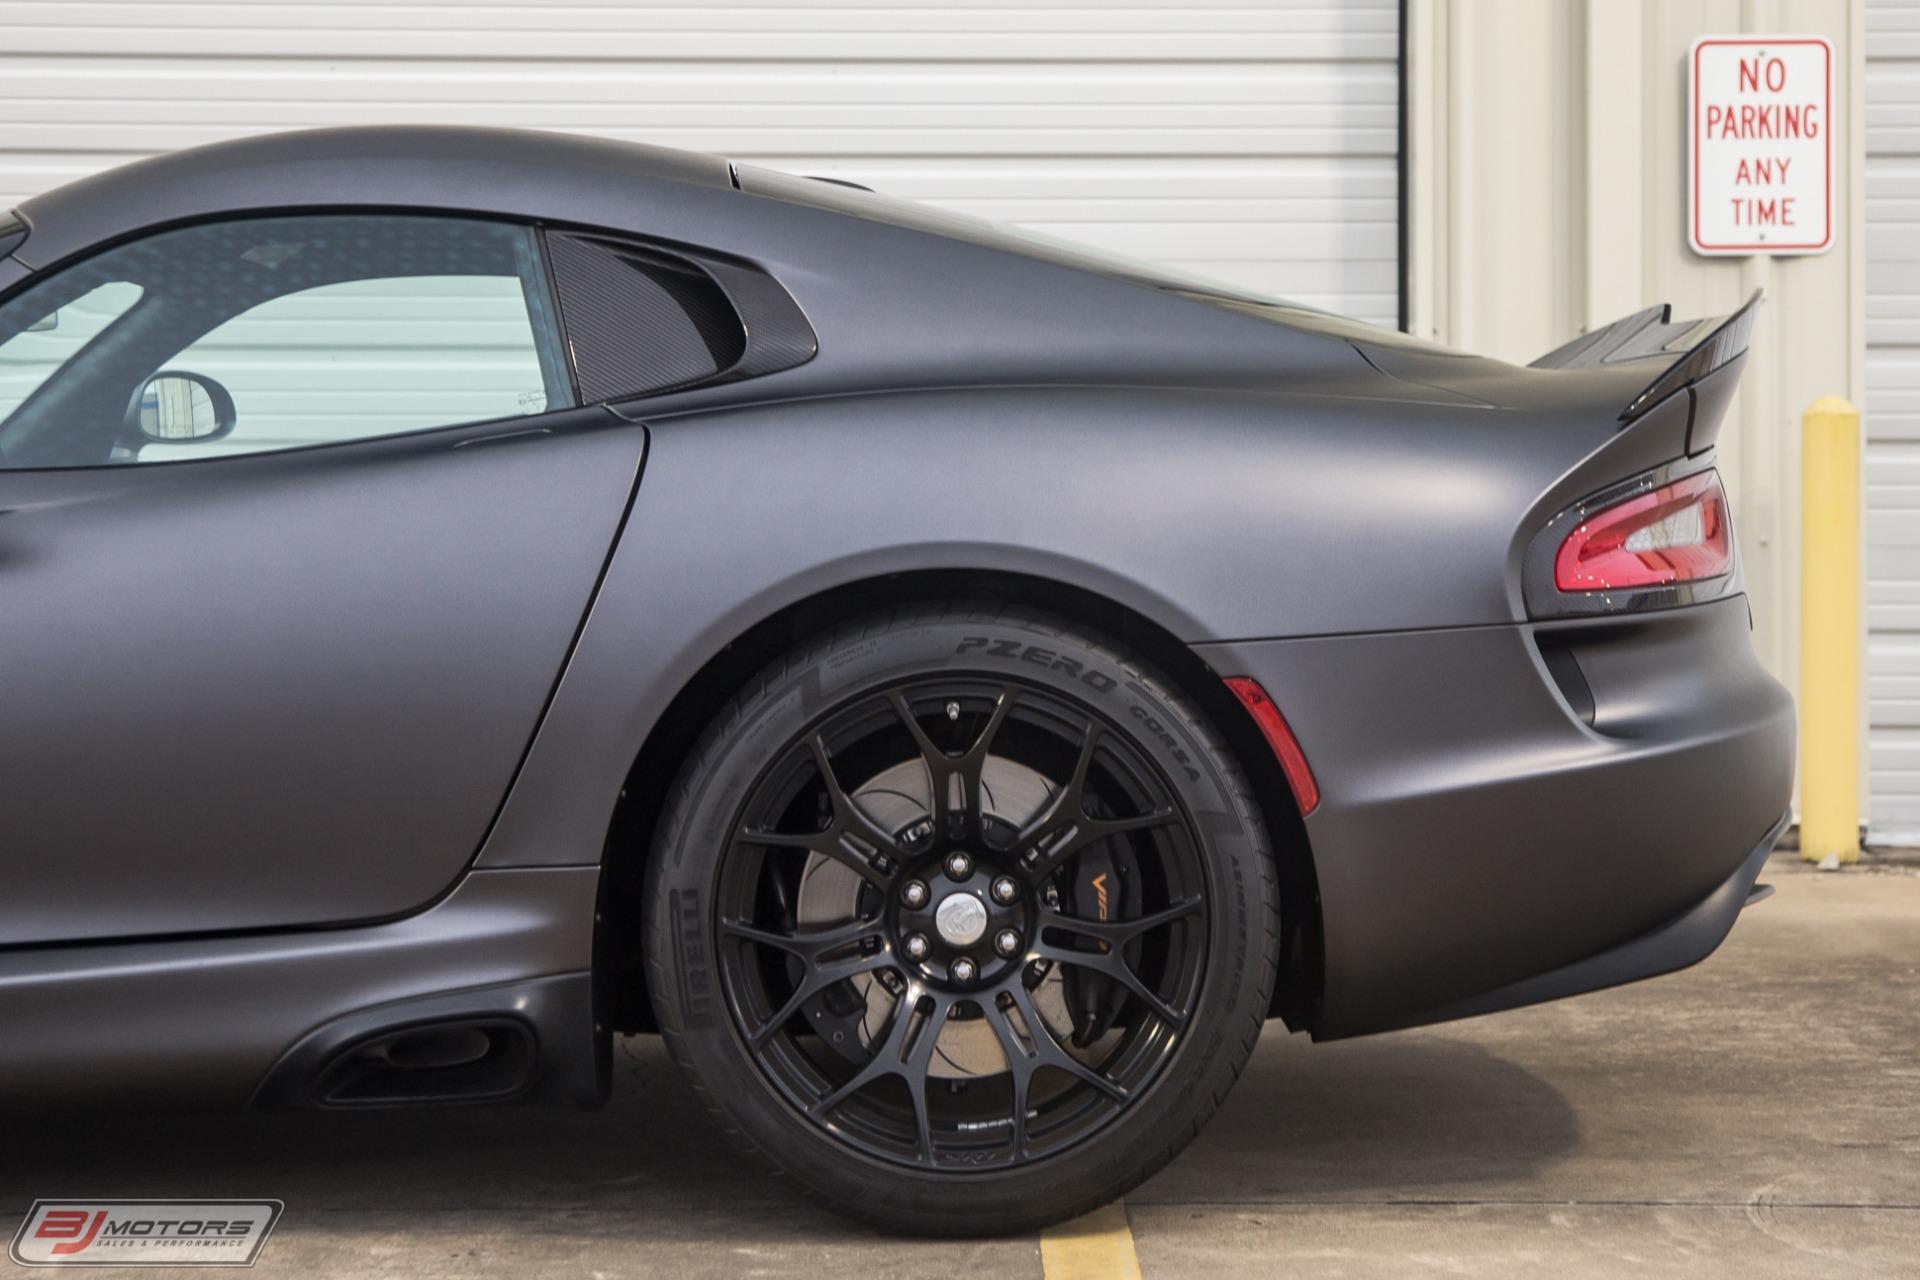 Used-2014-Dodge-SRT-Viper-GTS-Anodized-Carbon-TA